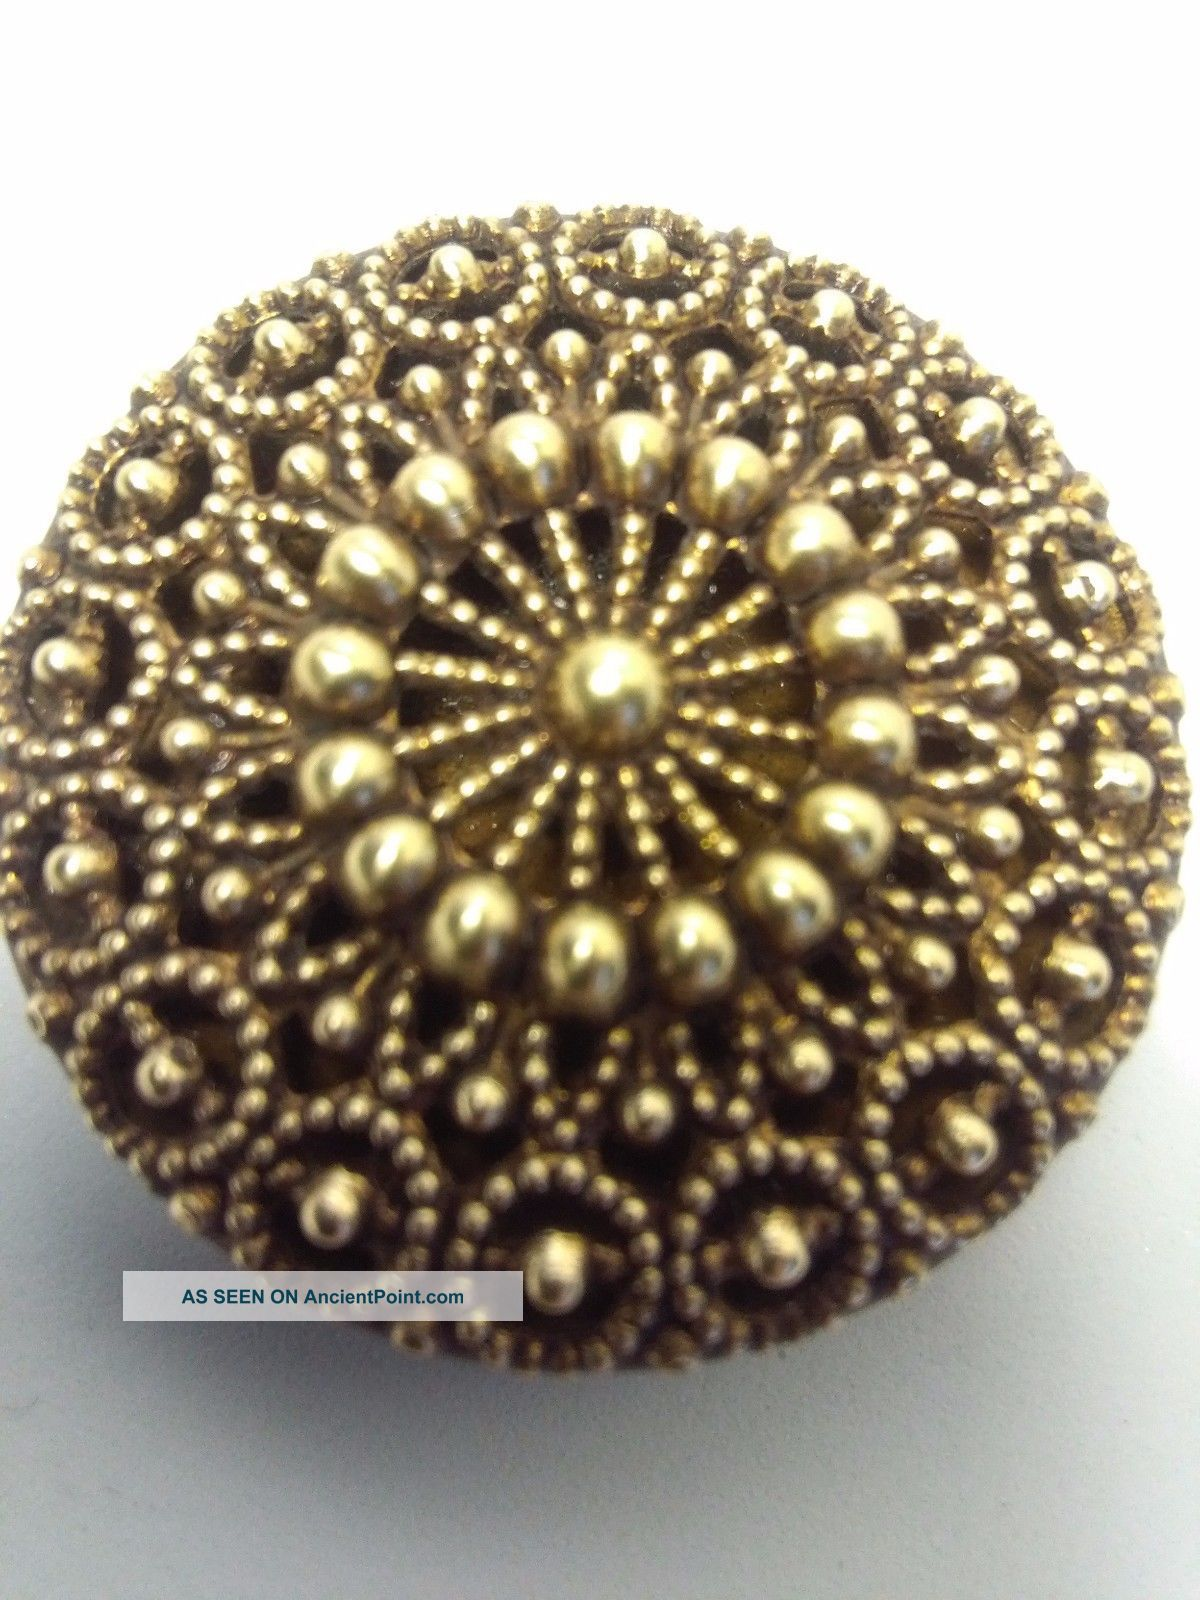 Antique Brass Openwork Button Metal Filigree Buttons photo